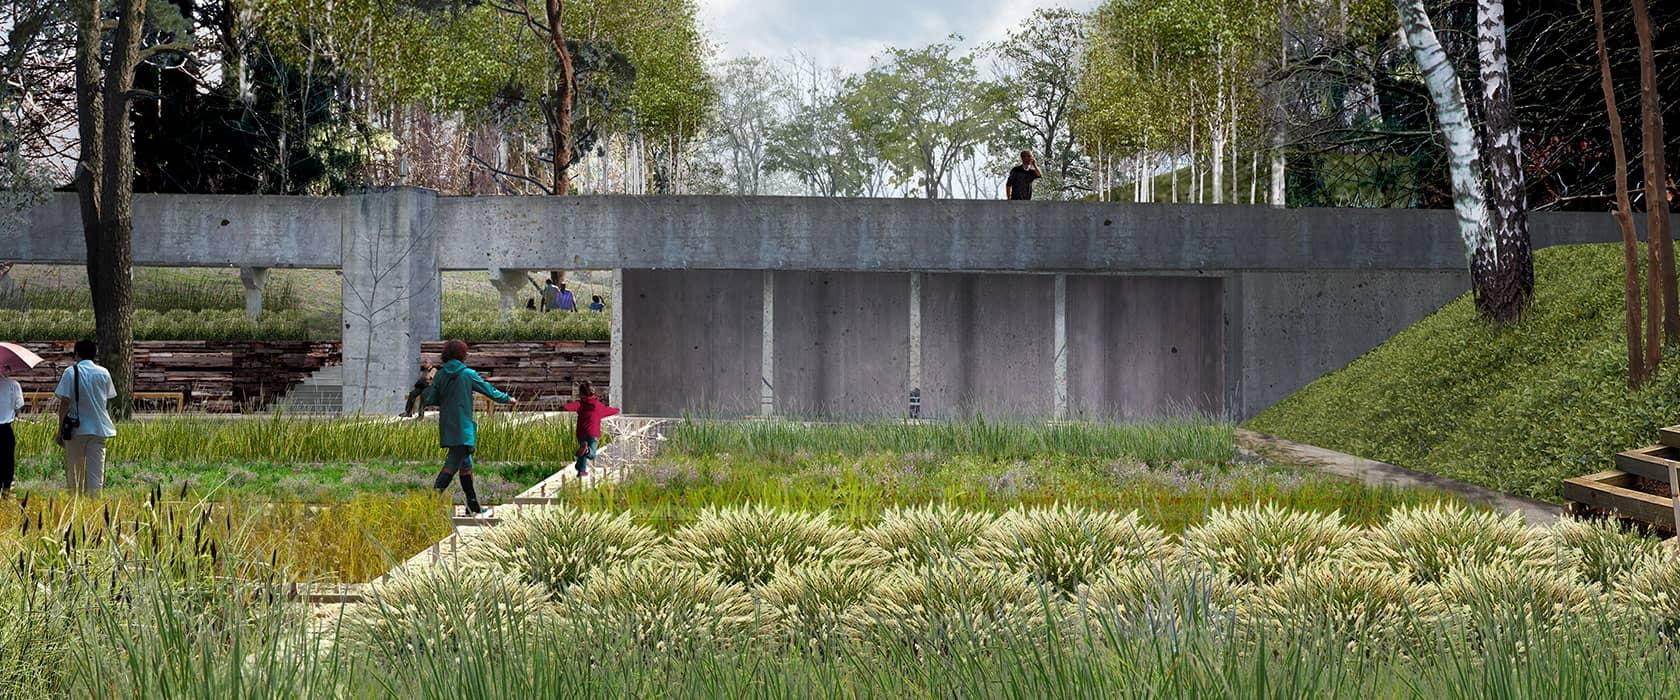 Ålebækken Ruinpark visualisering